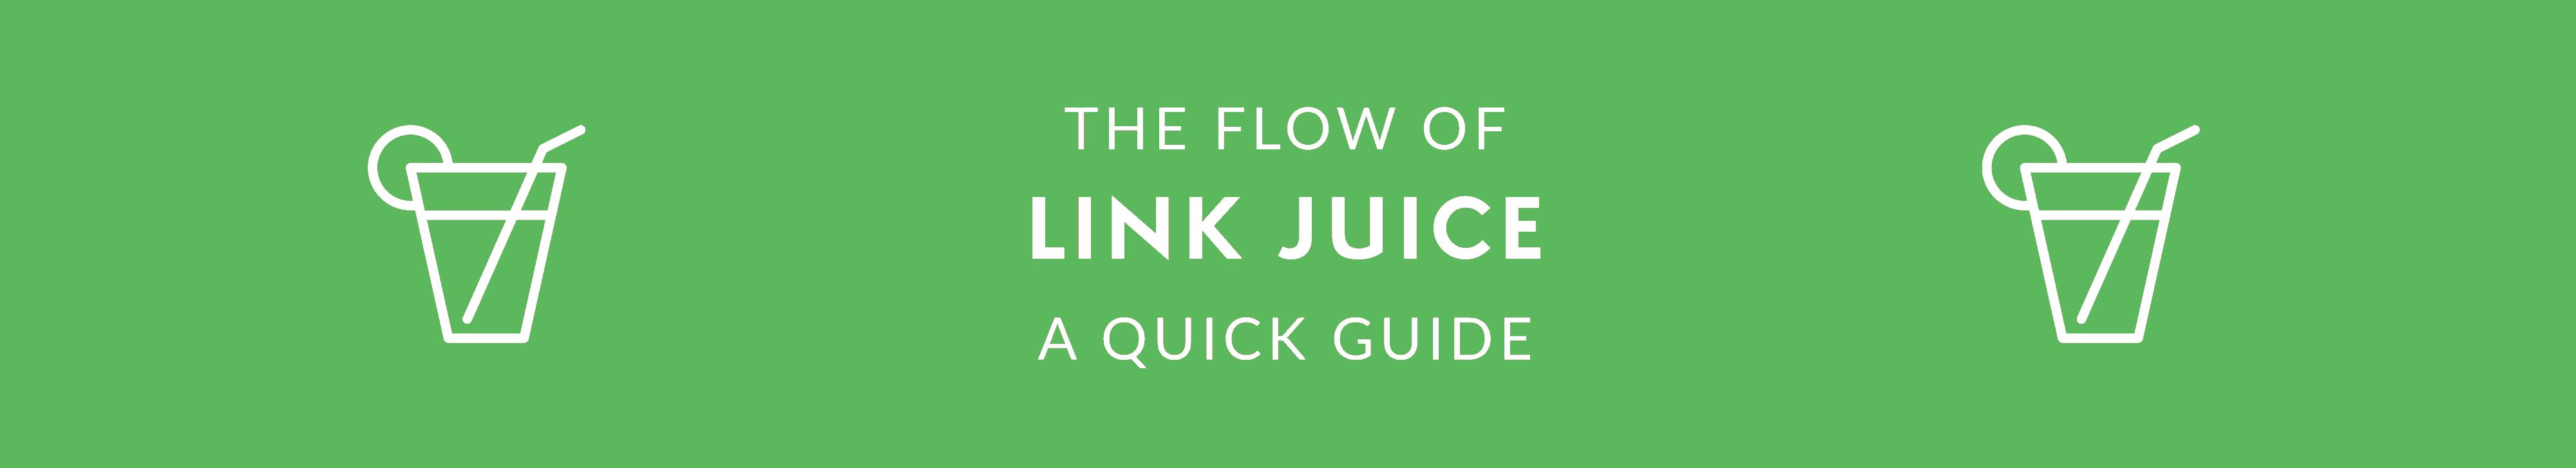 EN - SEO GUIDE - Link Juice